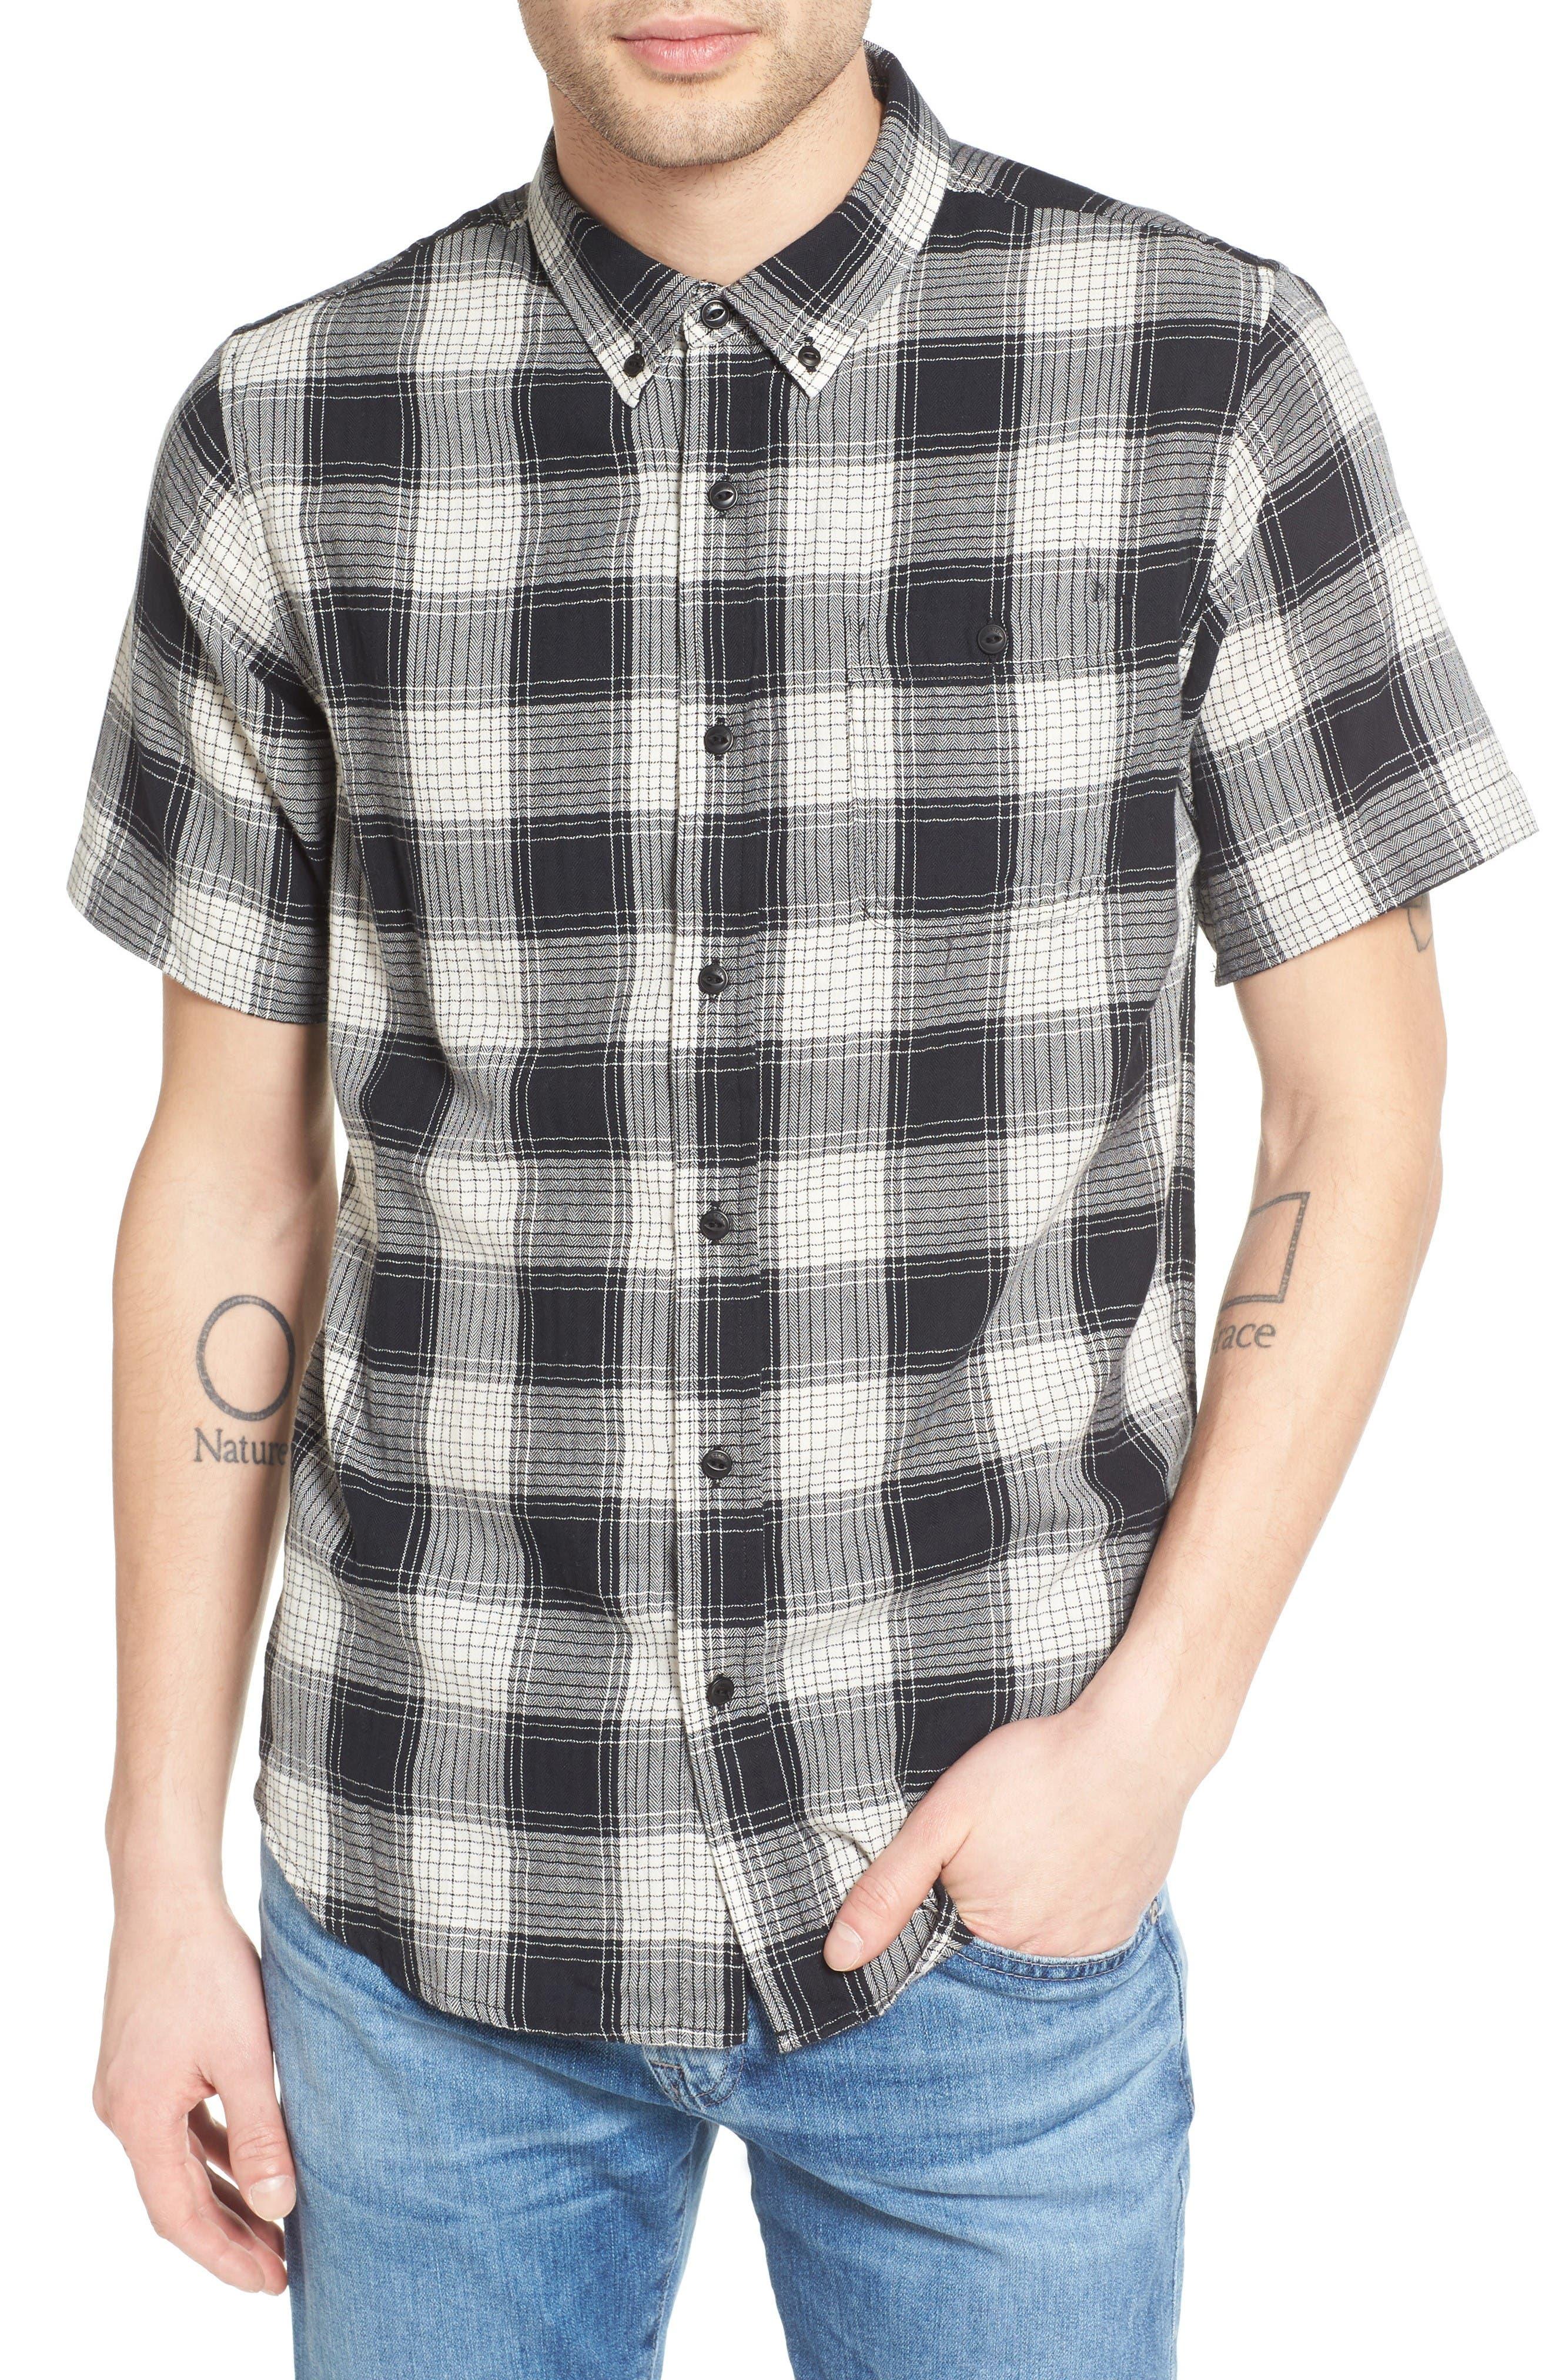 Alternate Image 1 Selected - Ezekiel Herringbone Woven Plaid Shirt